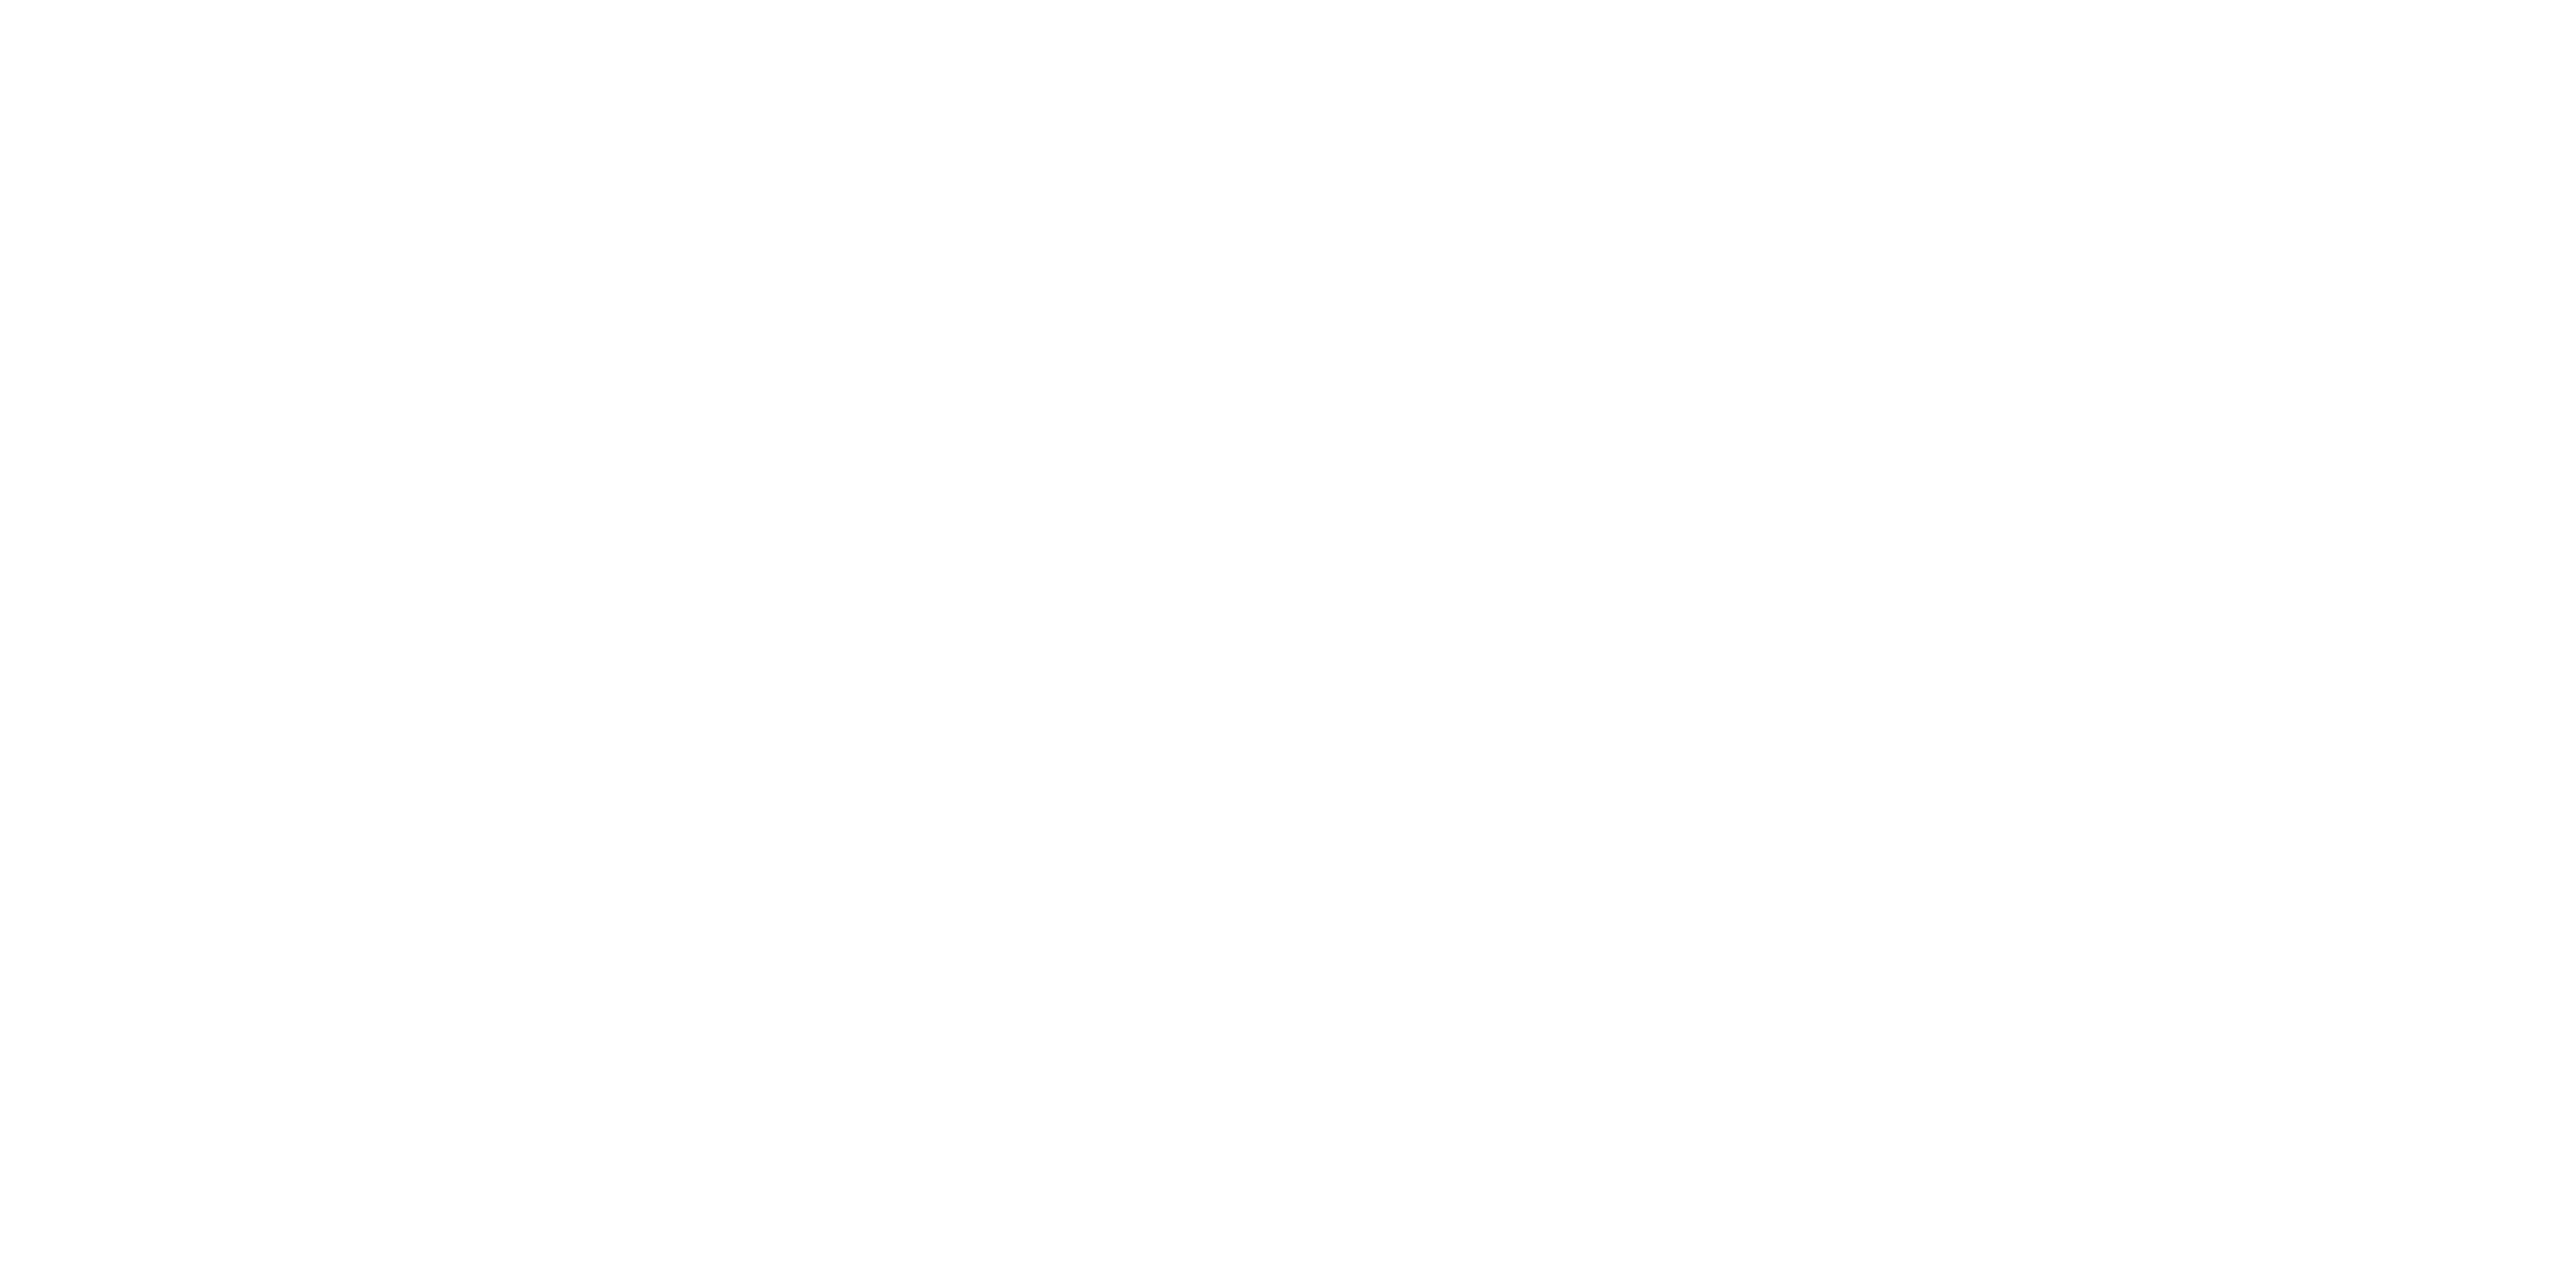 Kristen Myers Designs